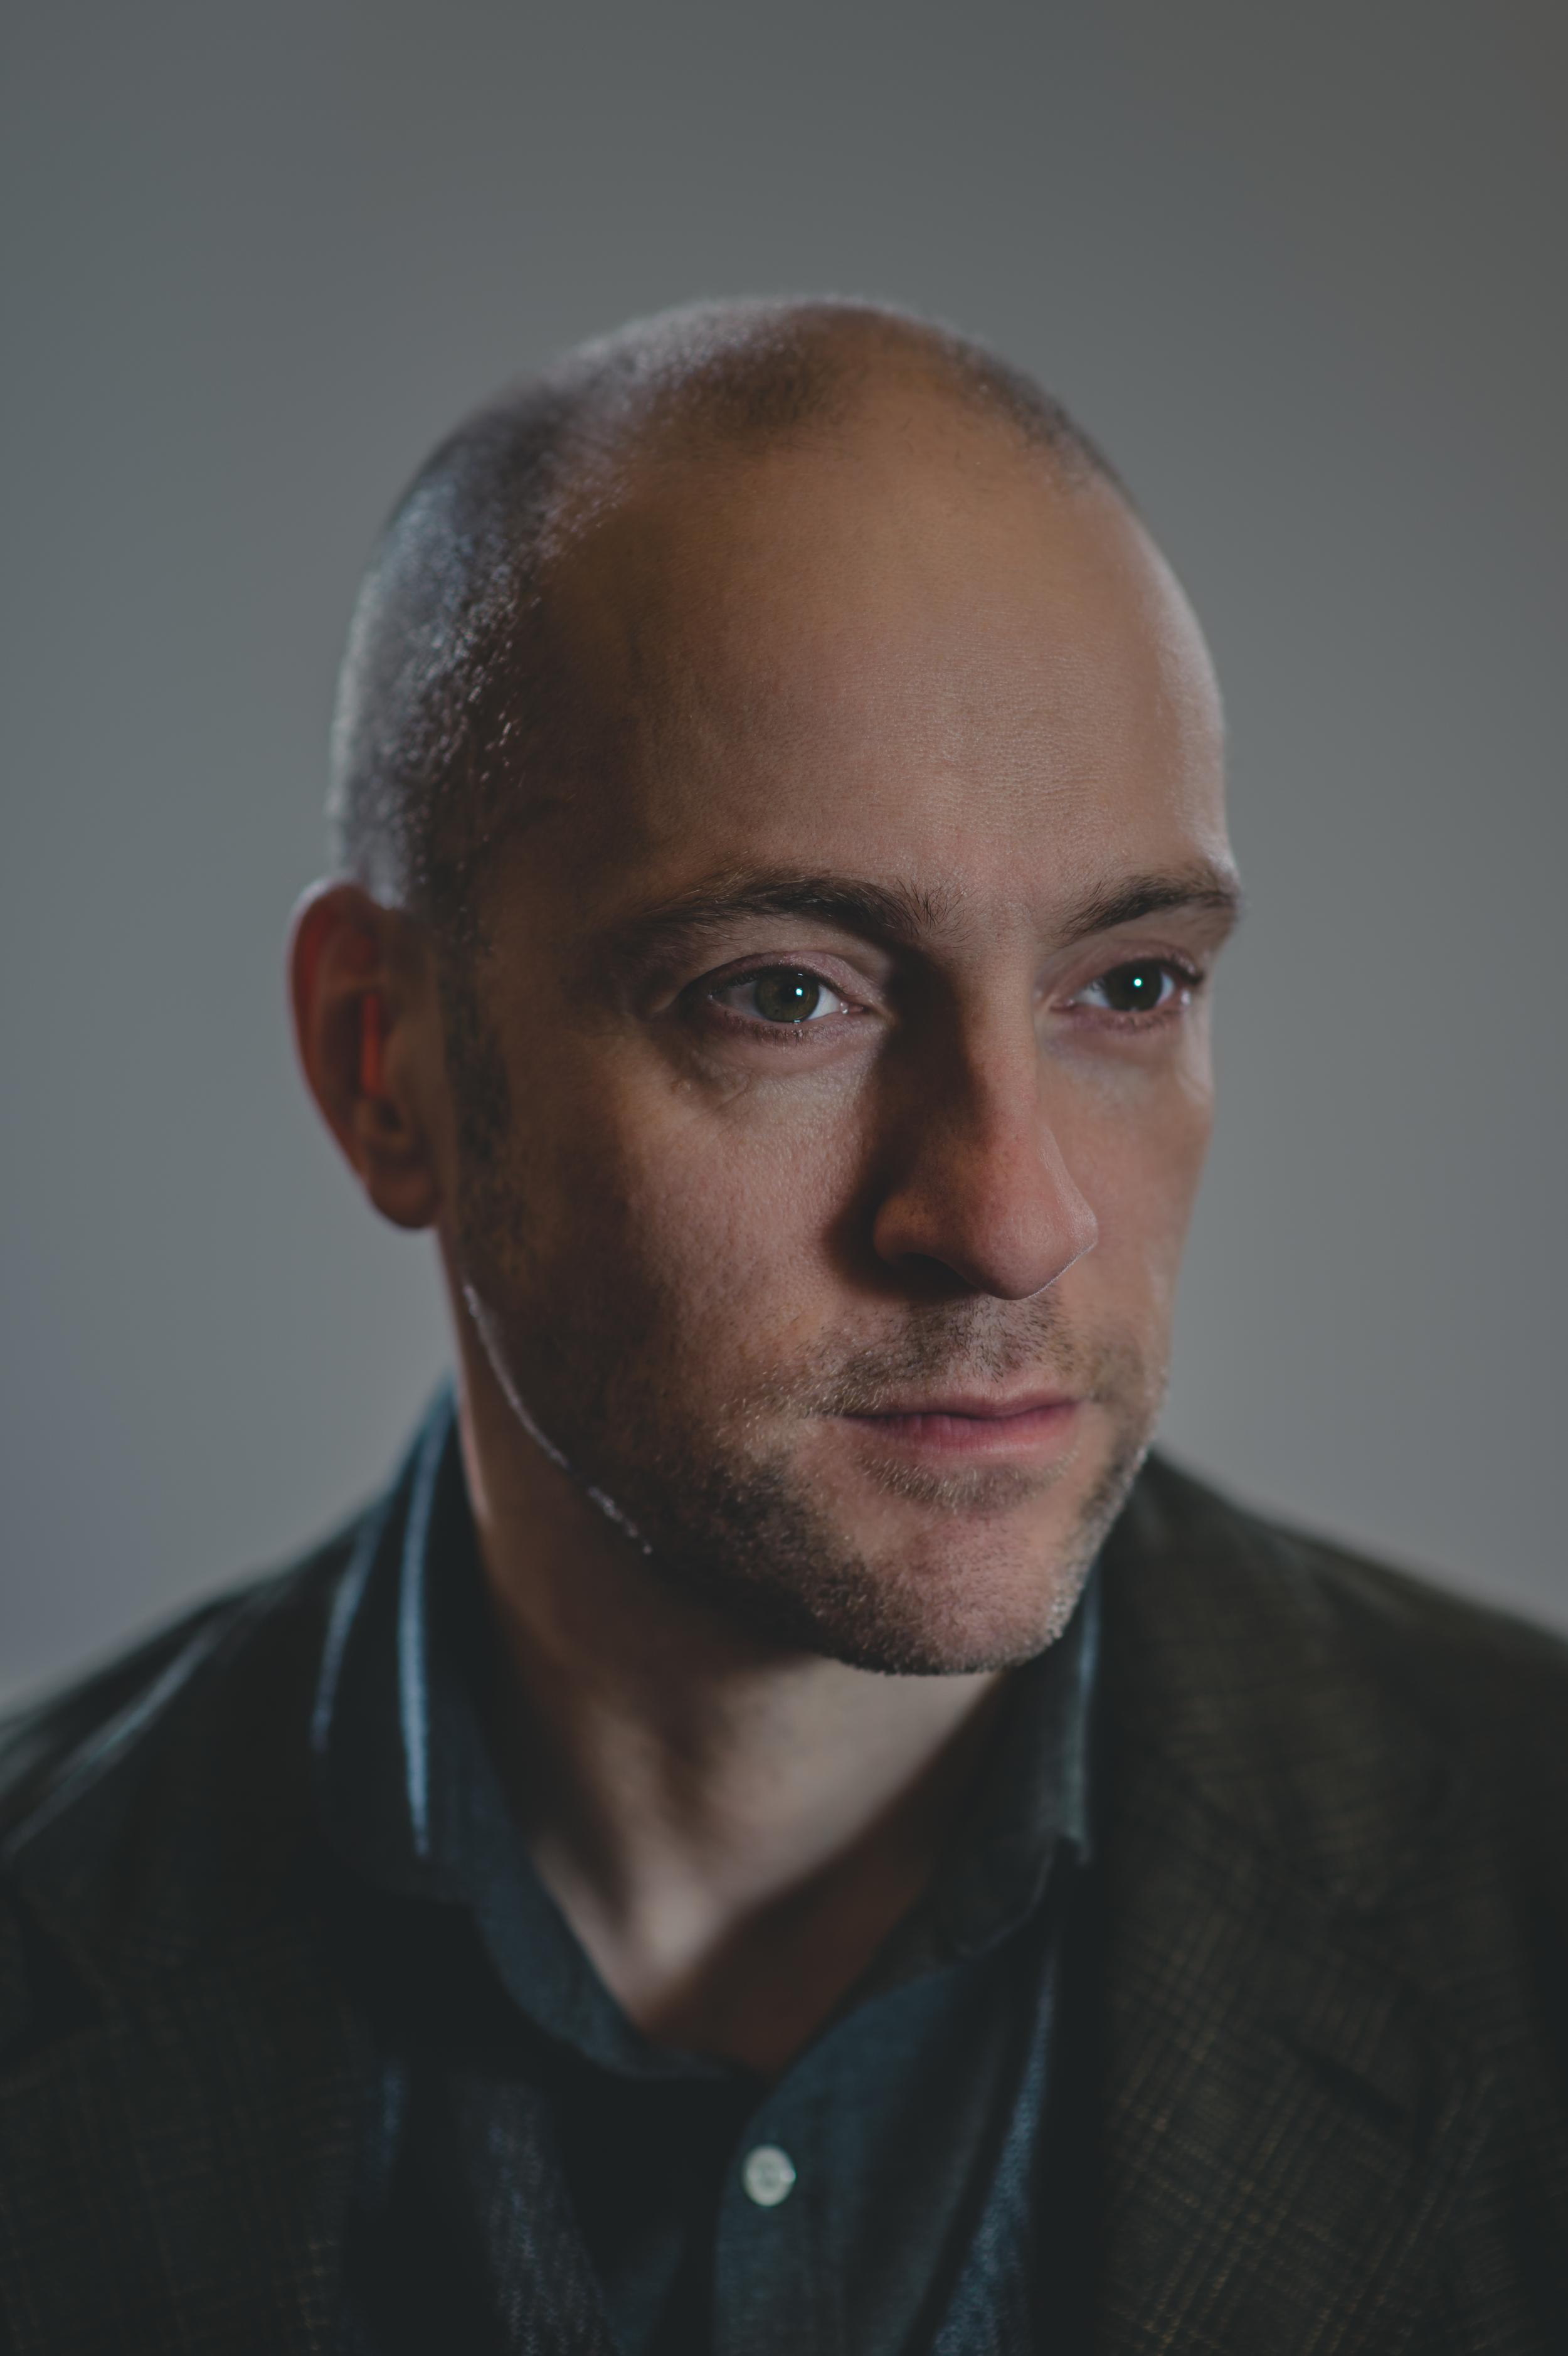 Derren_Brown_Portrait-1.jpg